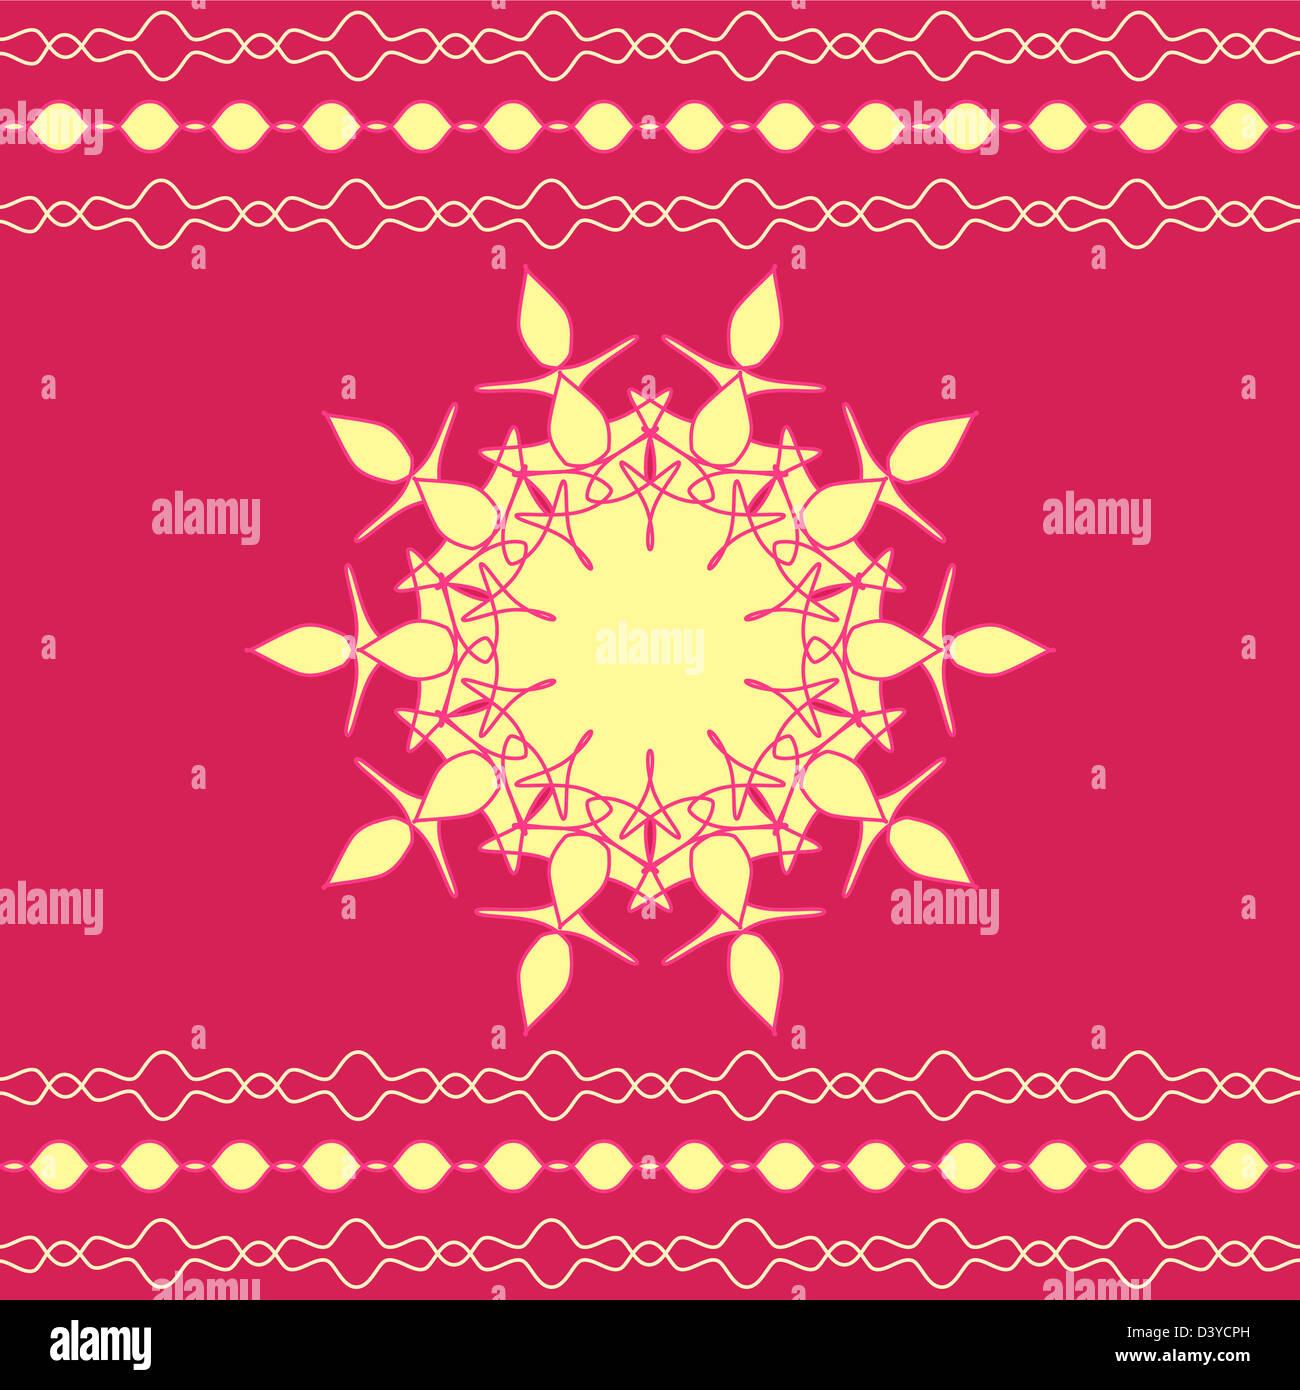 Artistic mandala design with stripes border Stock Photo